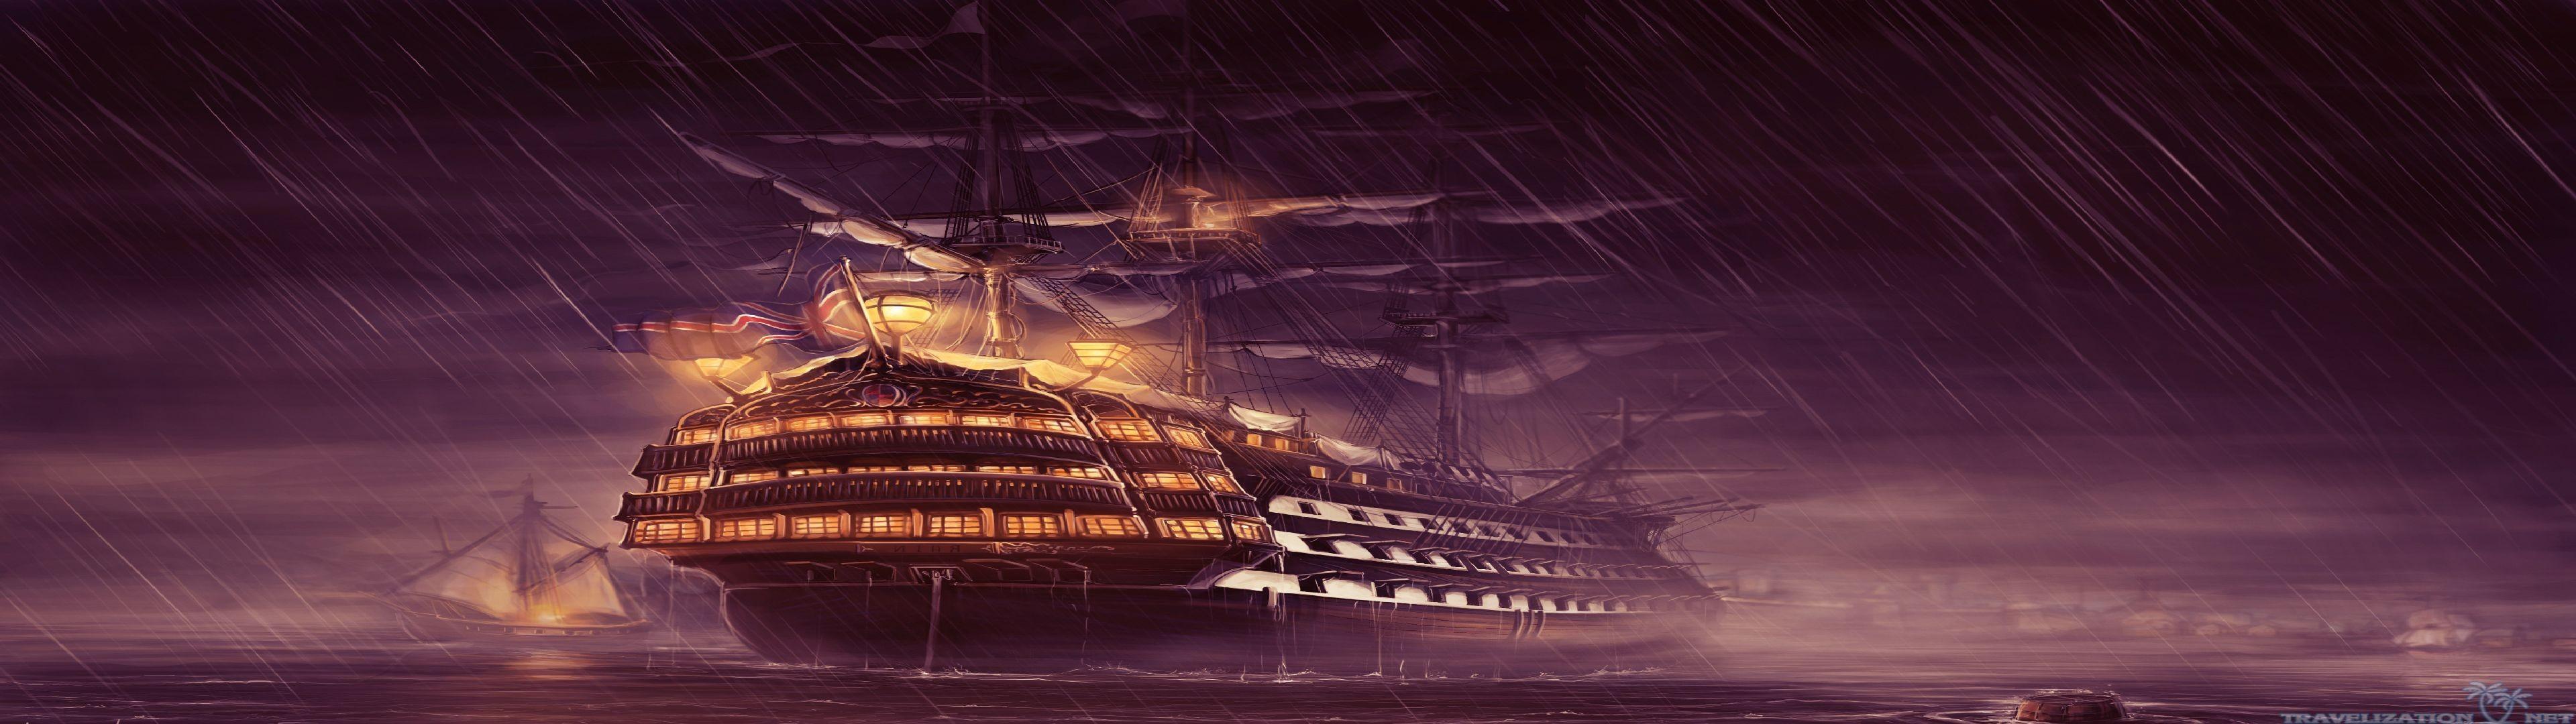 British ship sailing on the high seas: …